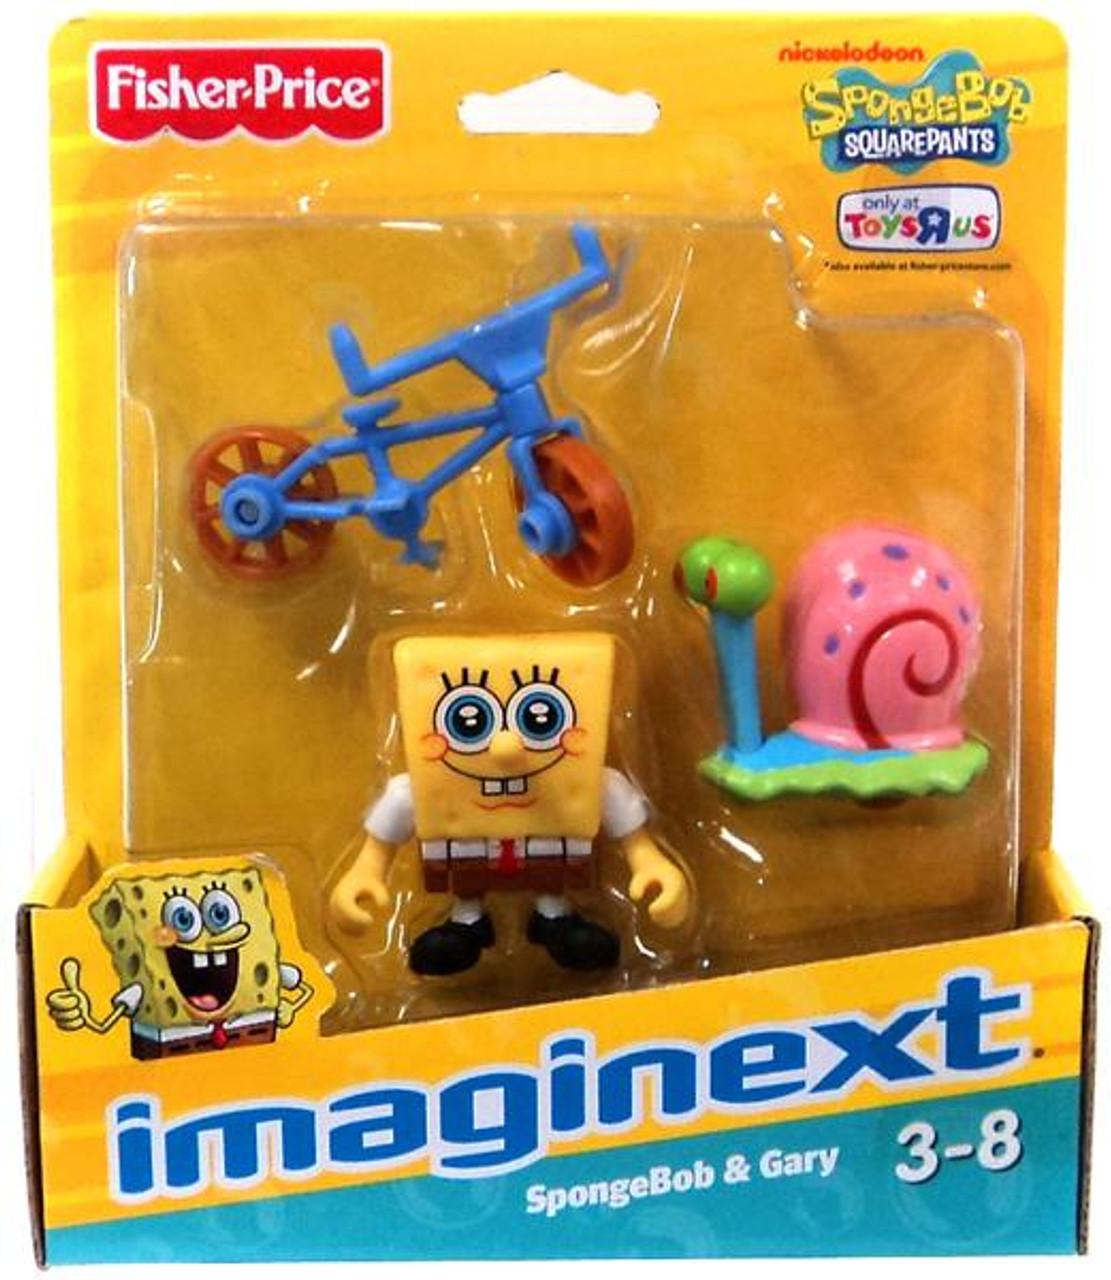 Fisher Price Spongebob Squarepants Imaginext SpongeBob & Gary the Snail Exclusive 2-Inch Mini Figure 2-Pack